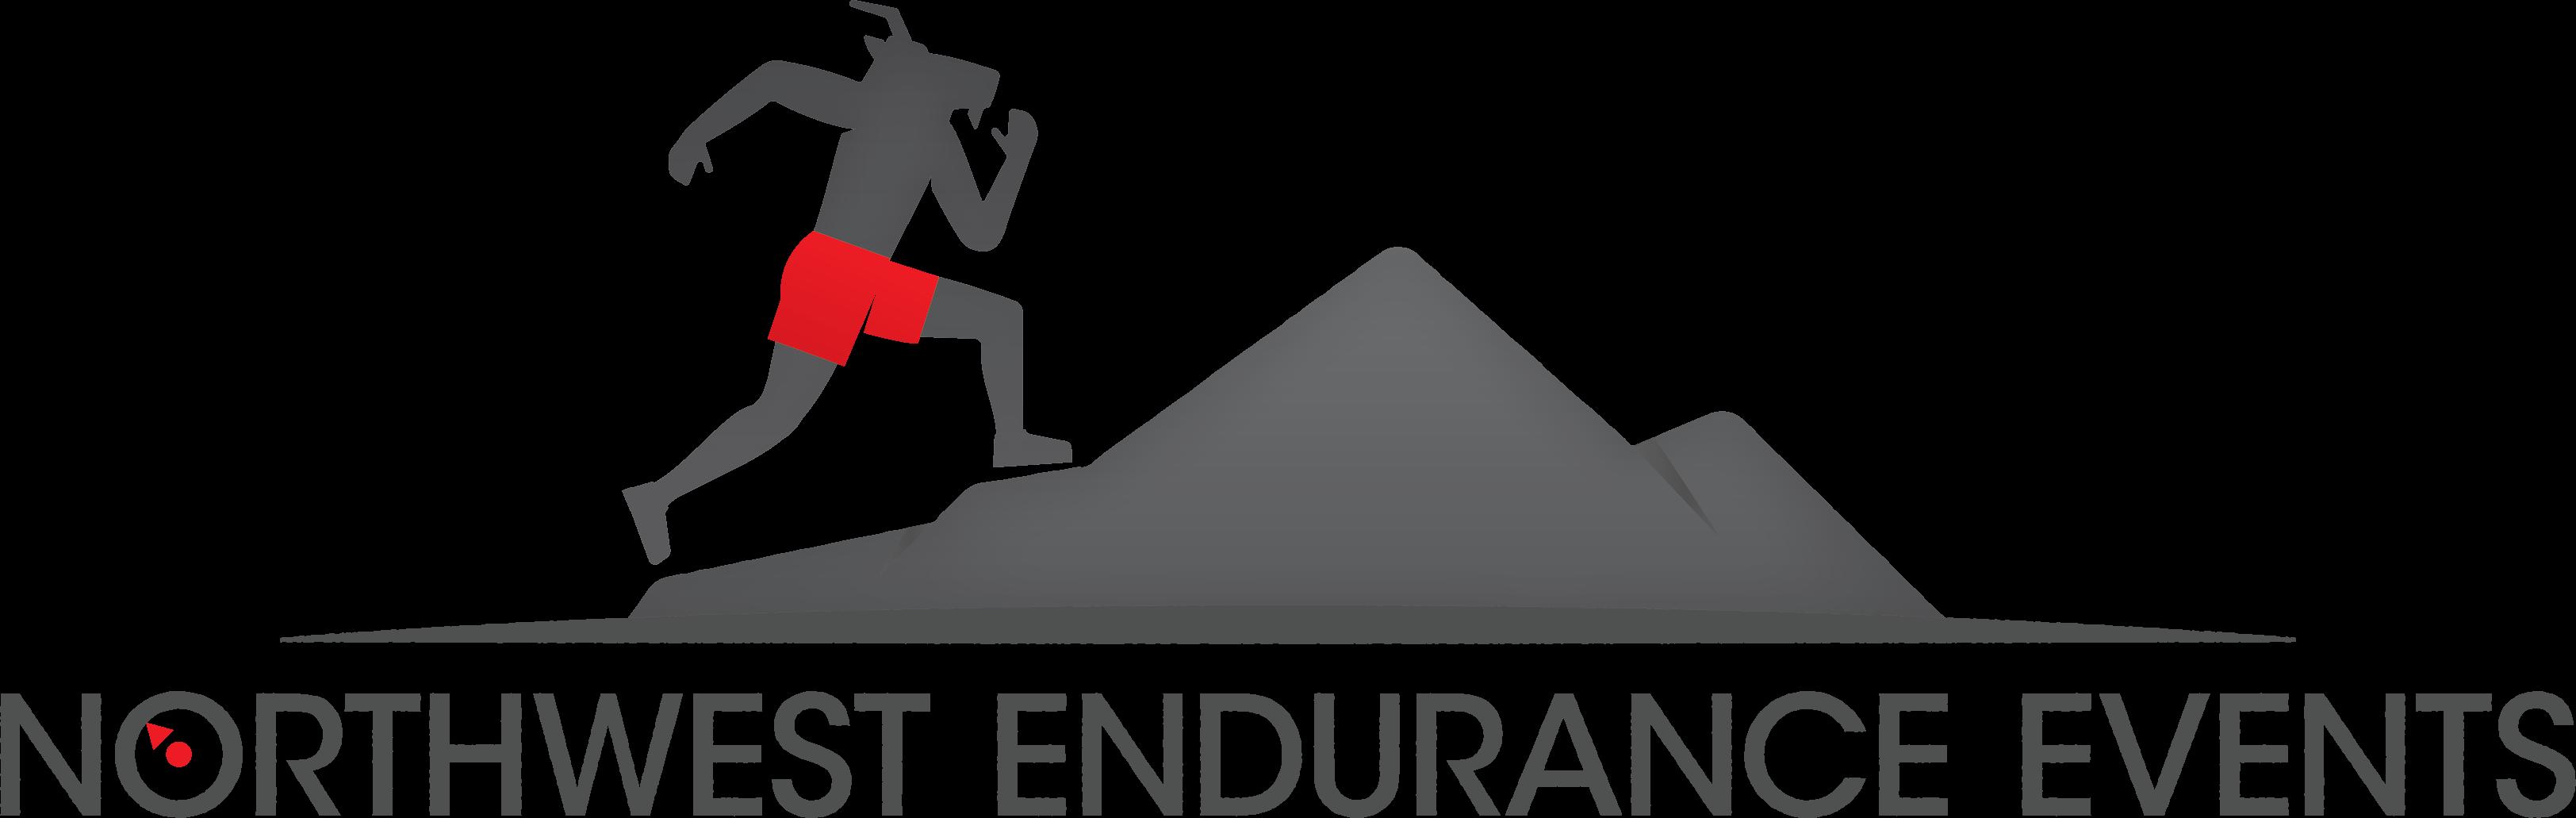 Last Chance Marathon and Half Marathon – NW Endurance Events